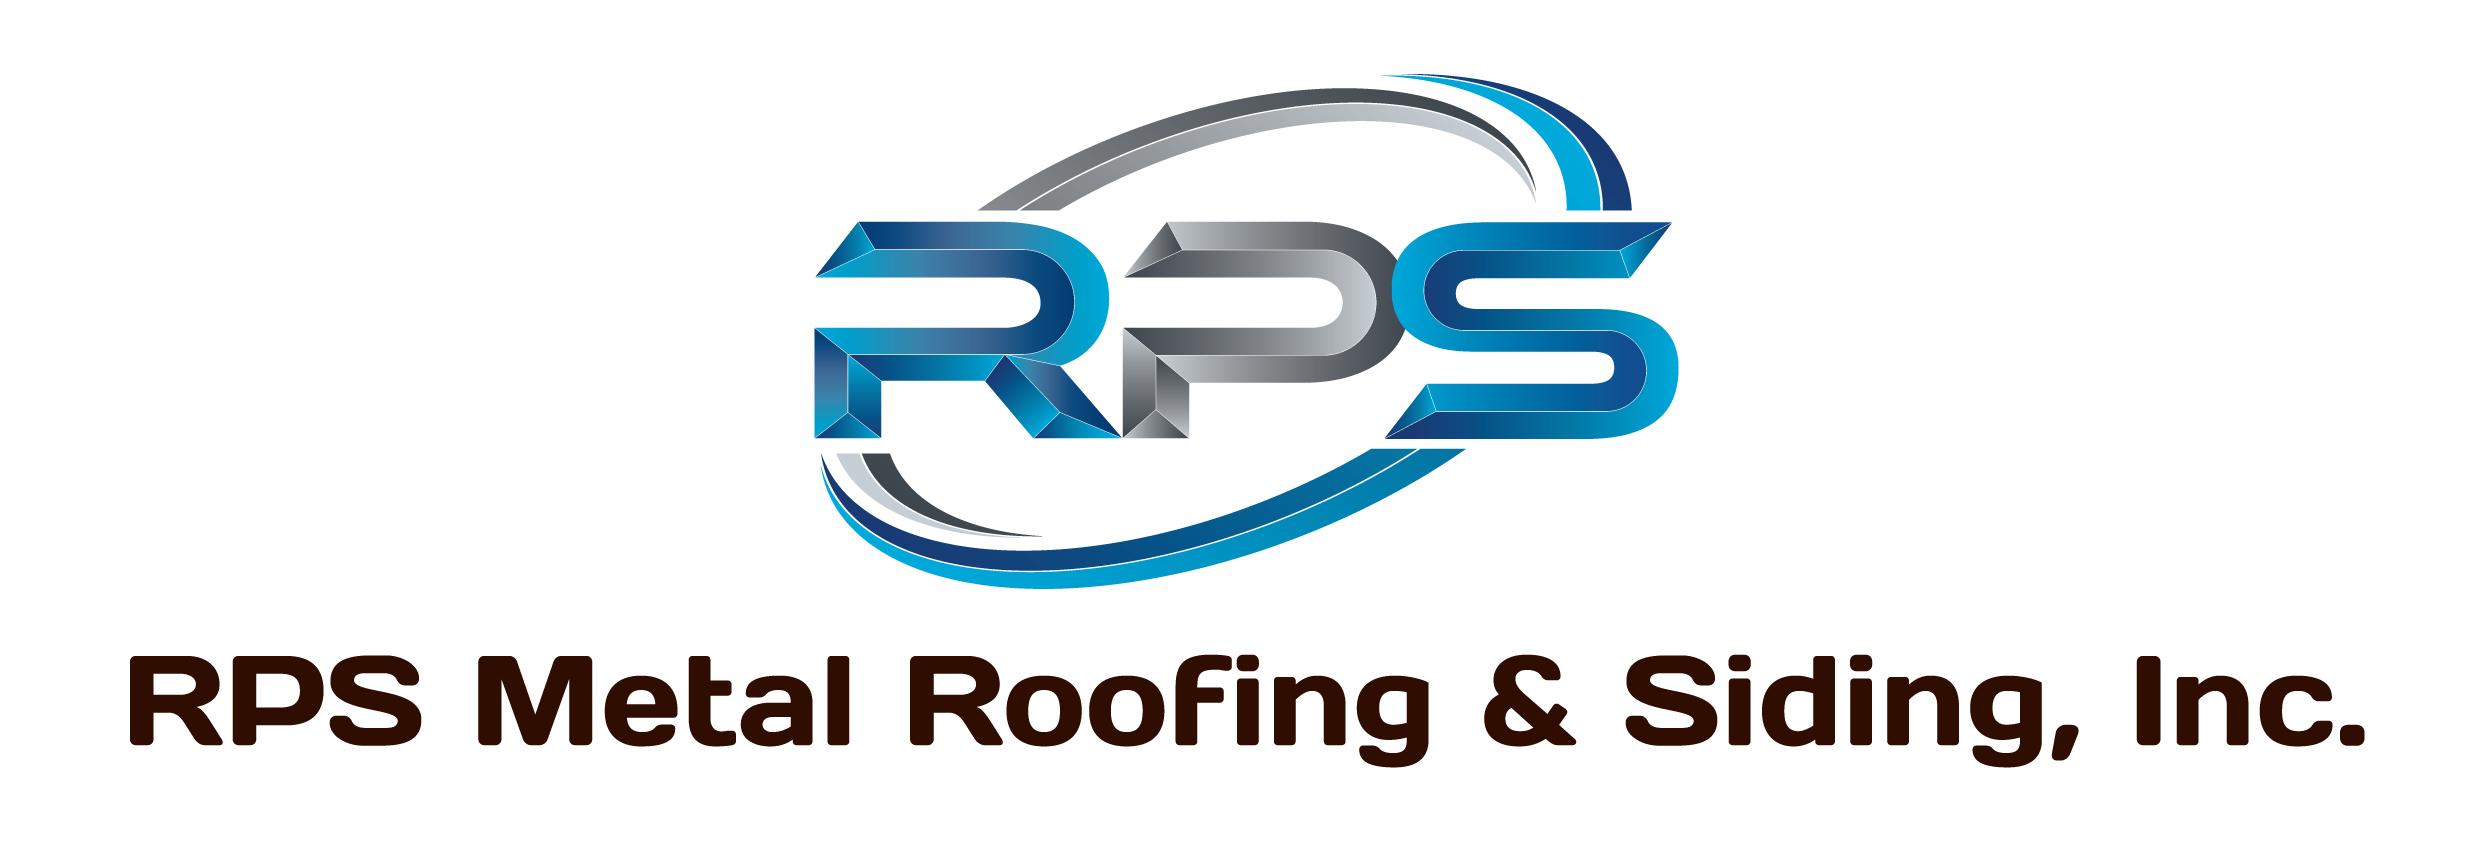 RPS_MetalRoofing_Logo_Wide